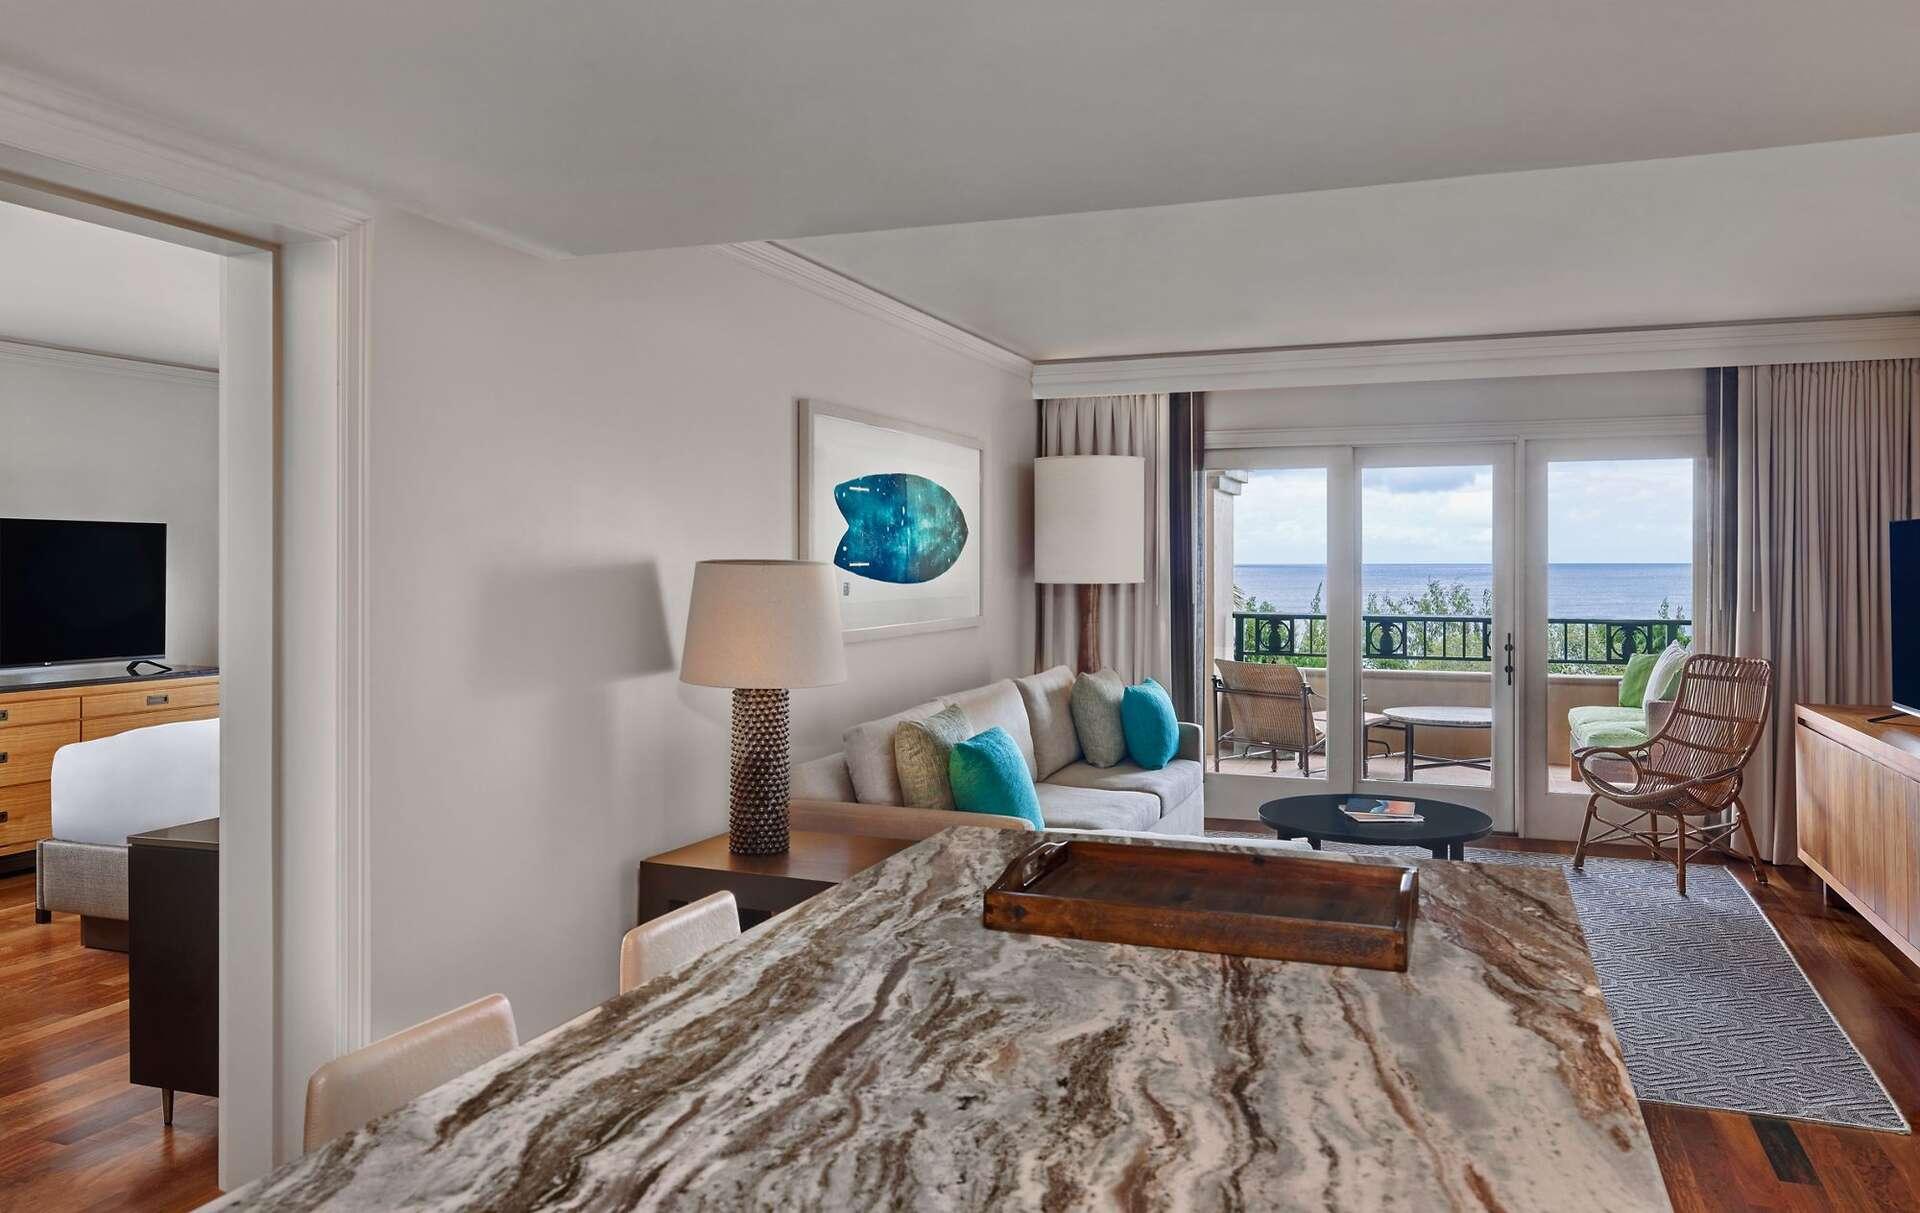 Luxury vacation rentals usa - Hawaii - Maui - The ritz carltonkapalua - Oceanfront 2 BDM - Image 1/16